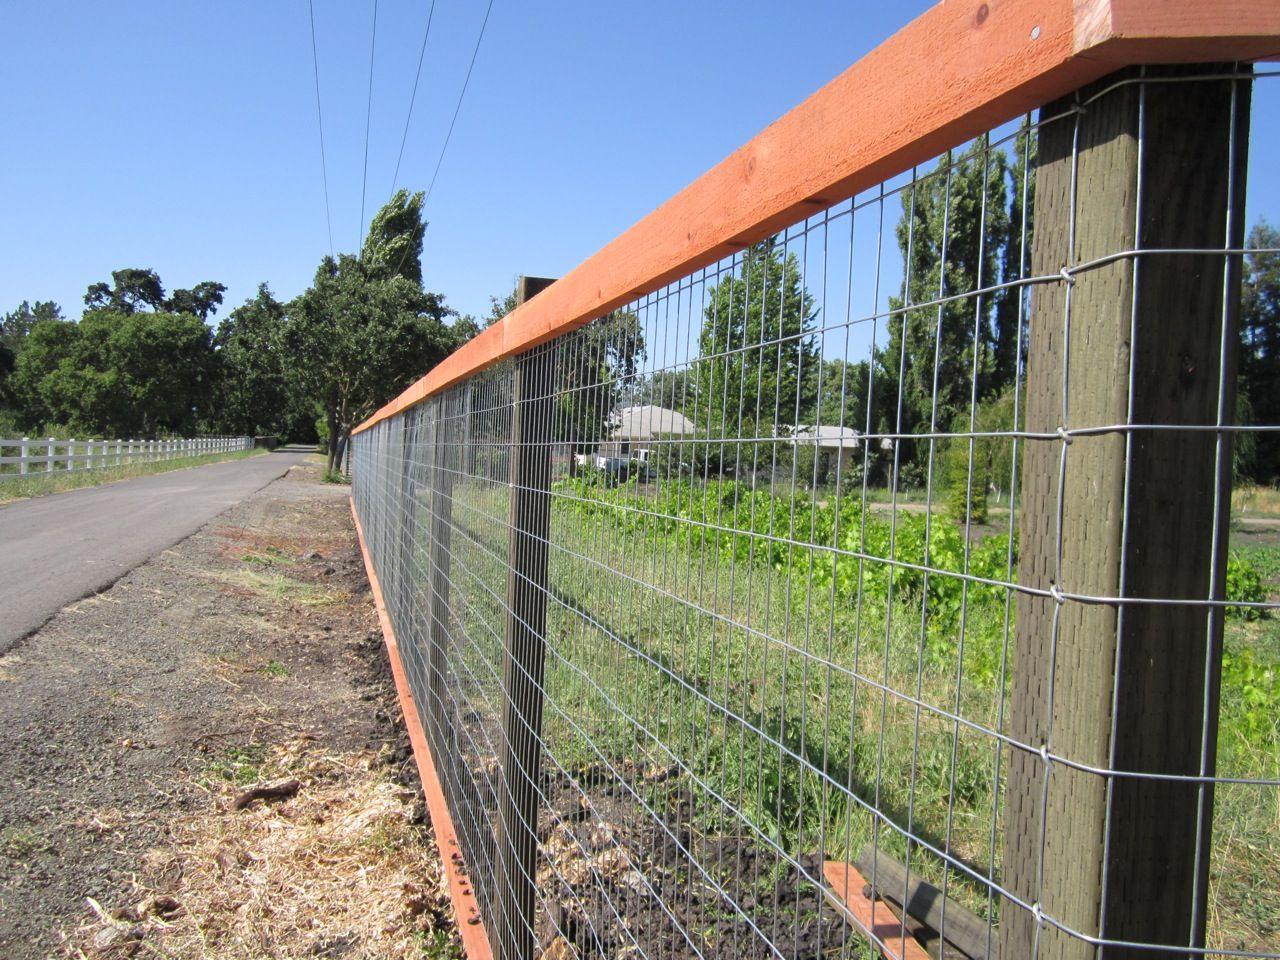 008-2.jpg 1,280×960 pixels | Fence, Wire fence, Welded ...